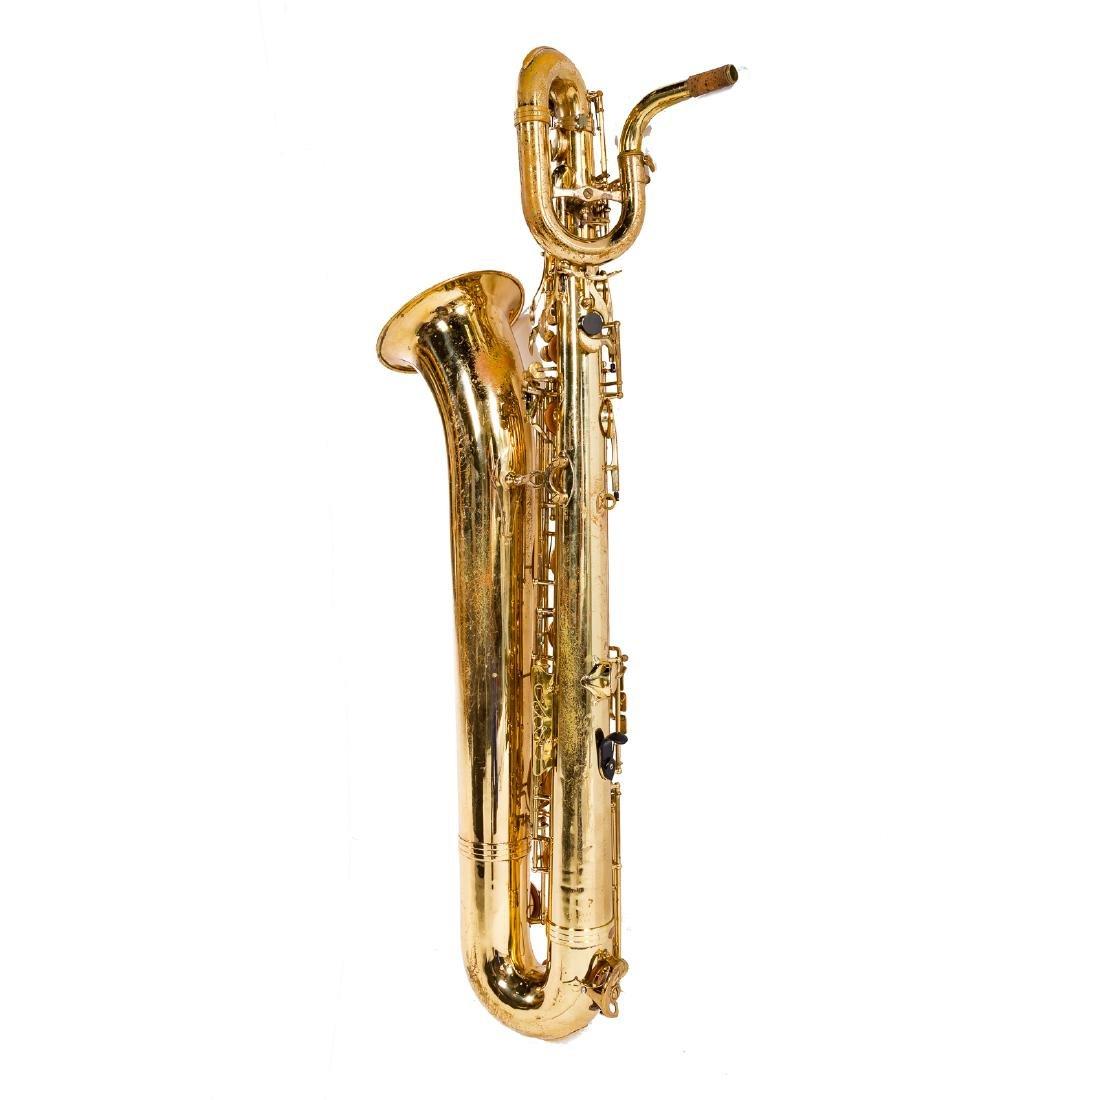 K.H.S. Jupiter alto saxophone - 3